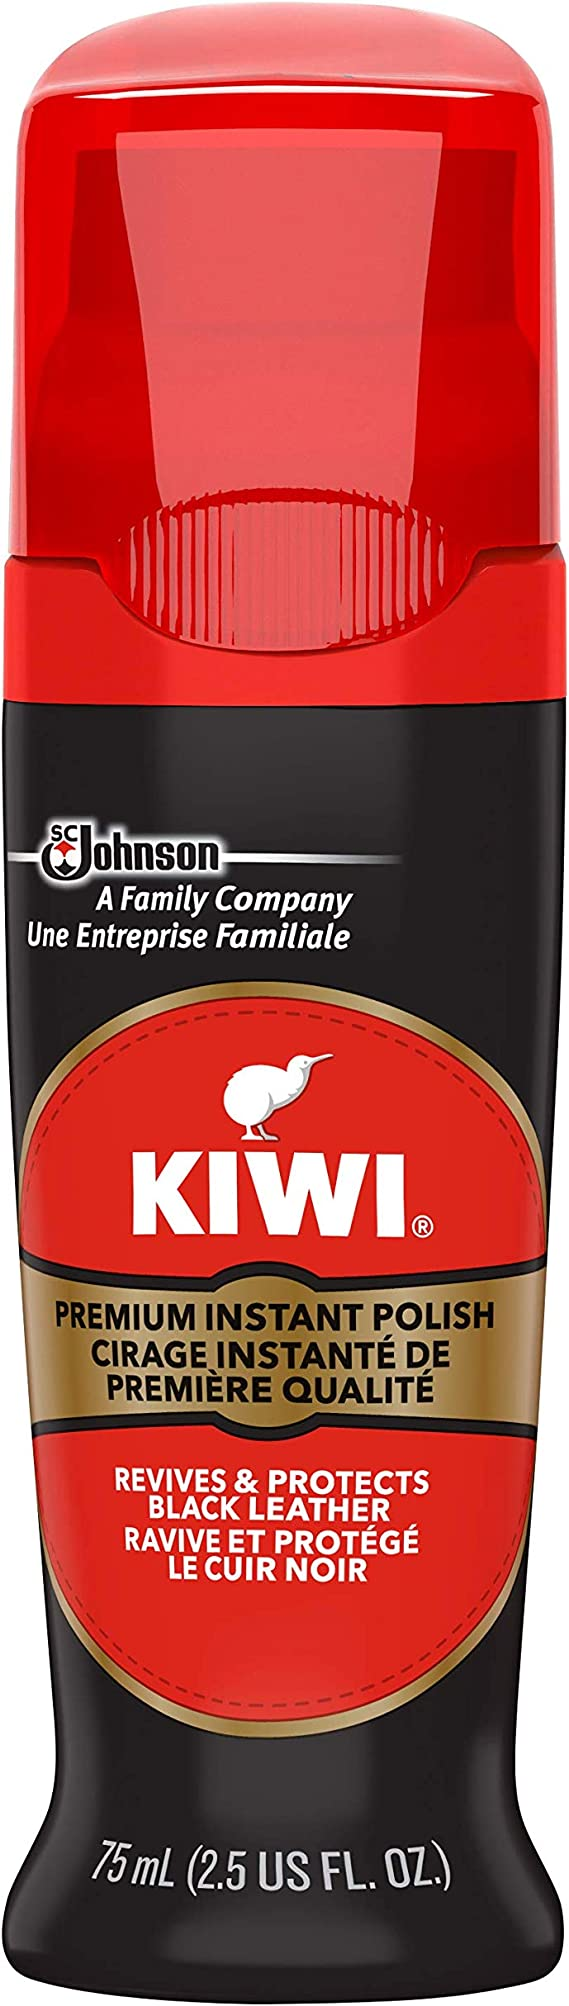 Nourishes /& Protects Wax Leather Coating Shine 36g Kiwi Shoe Polish Shine